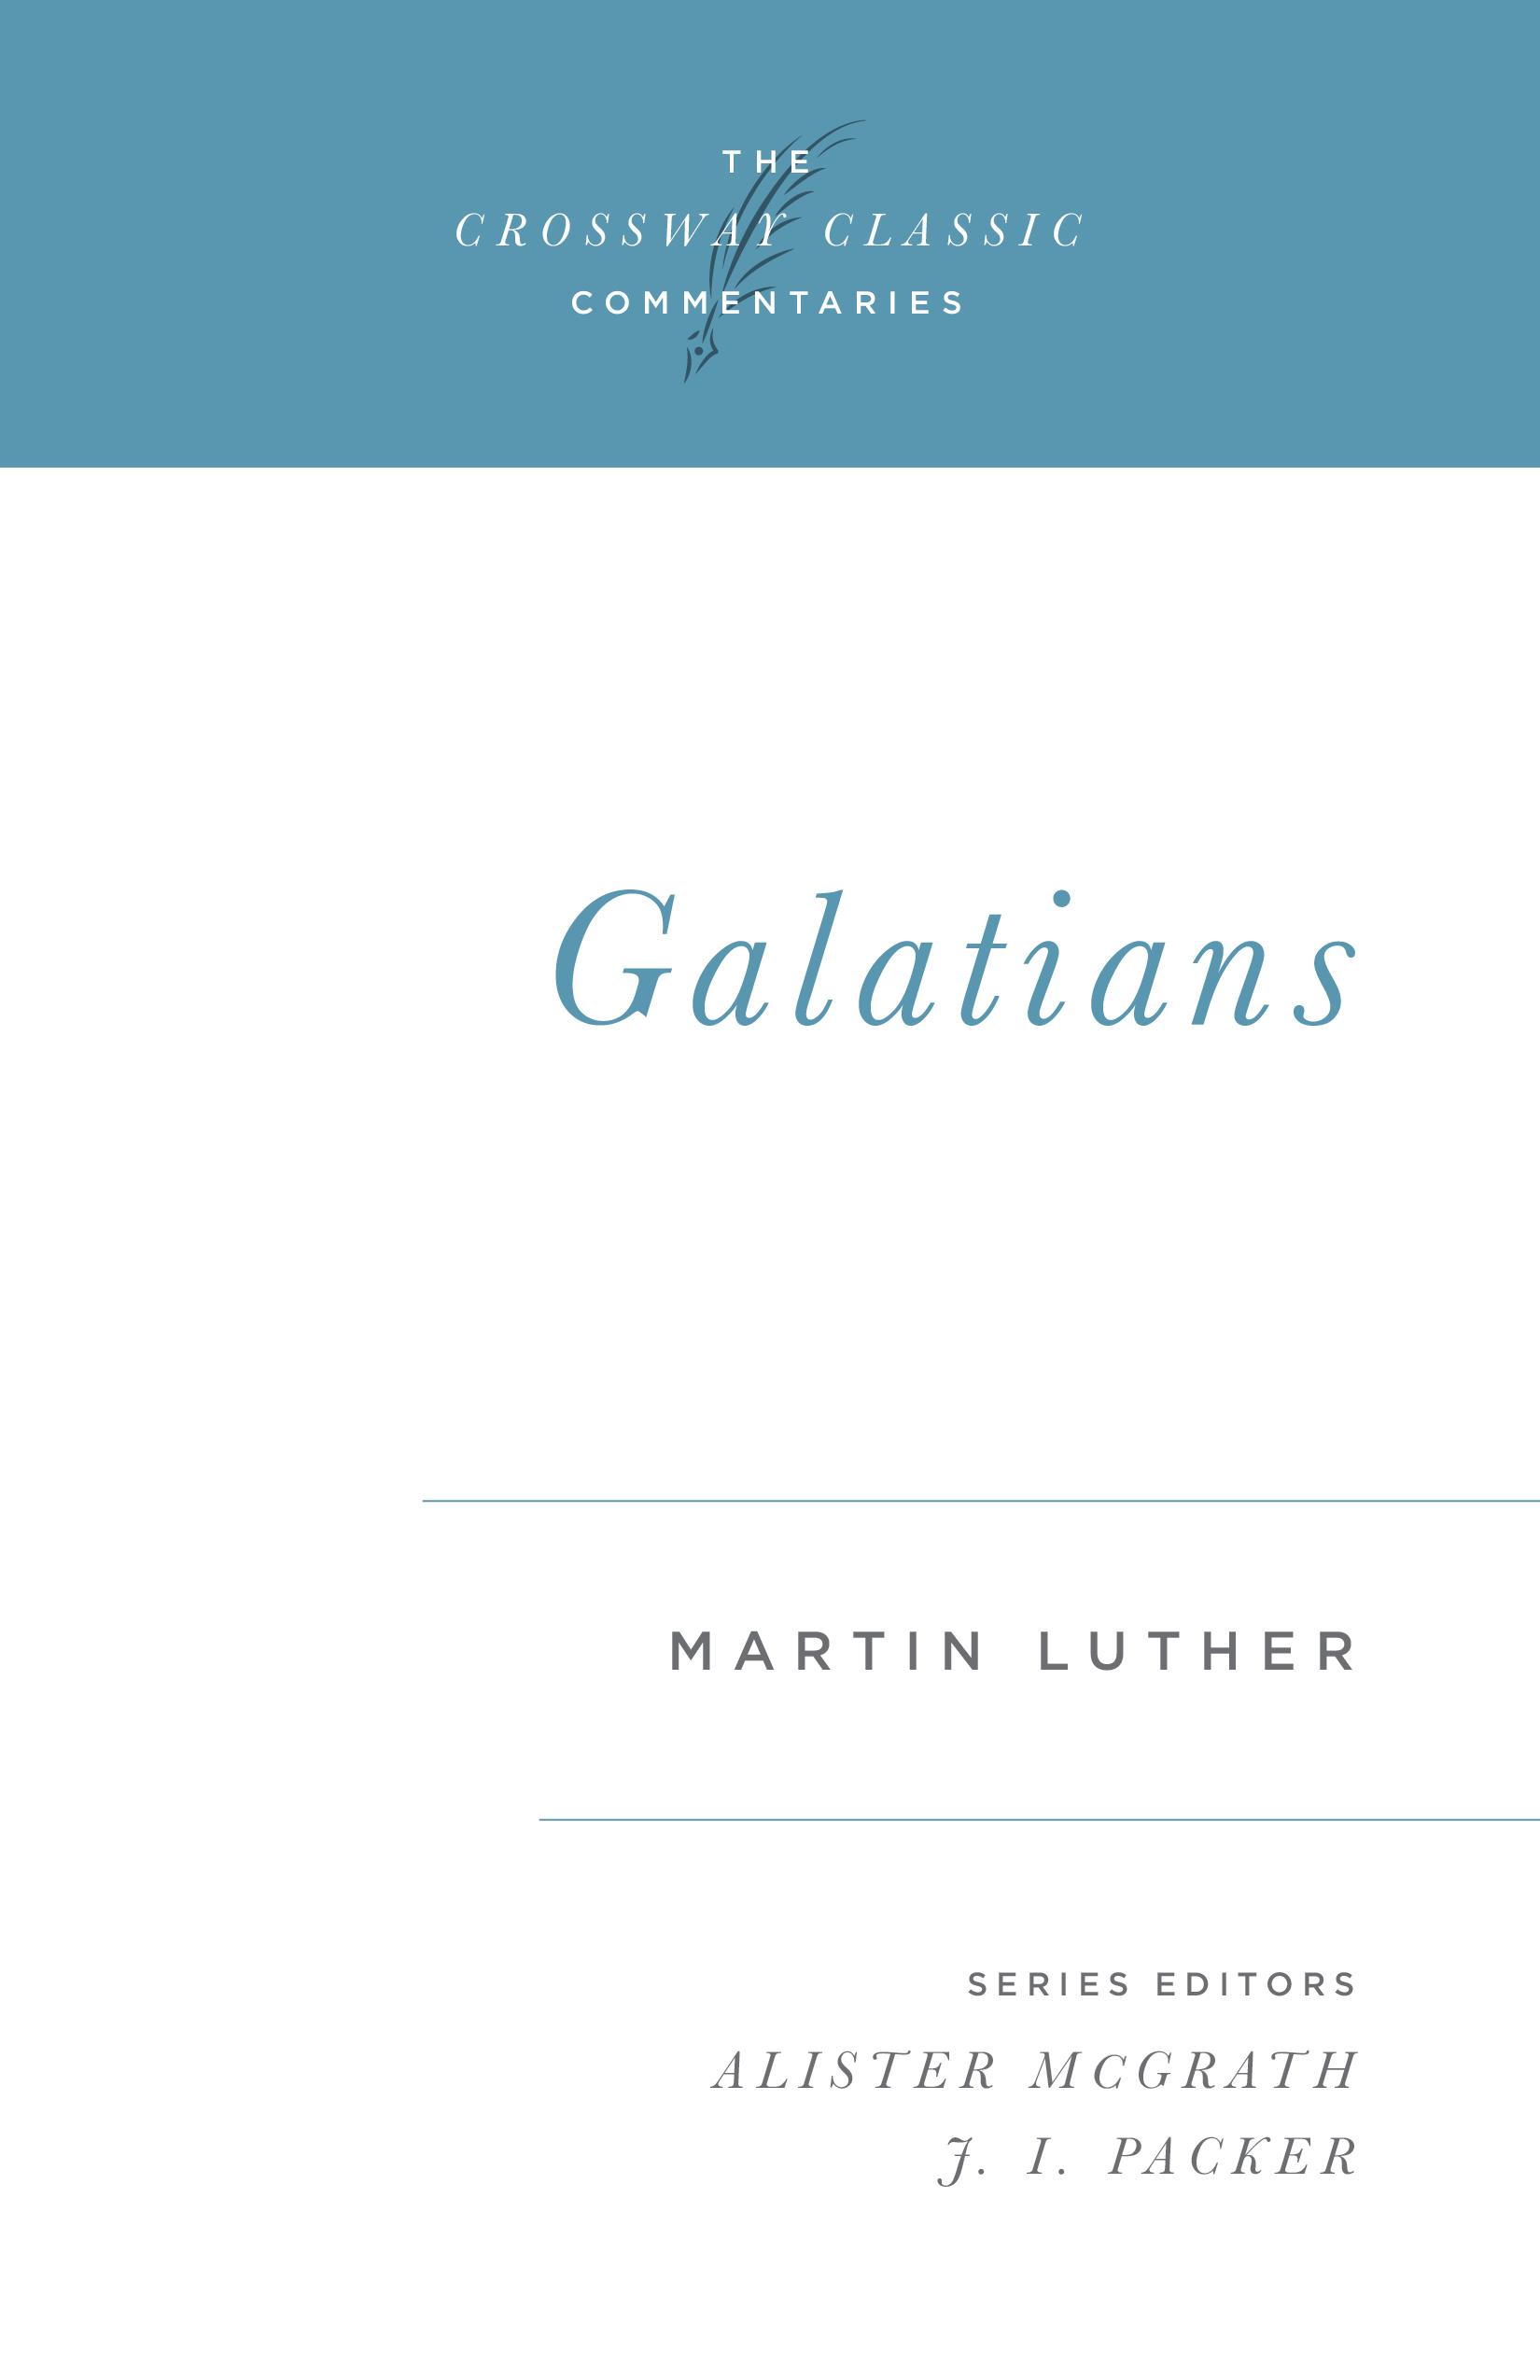 Crossway Classic Commentaries - Galatians